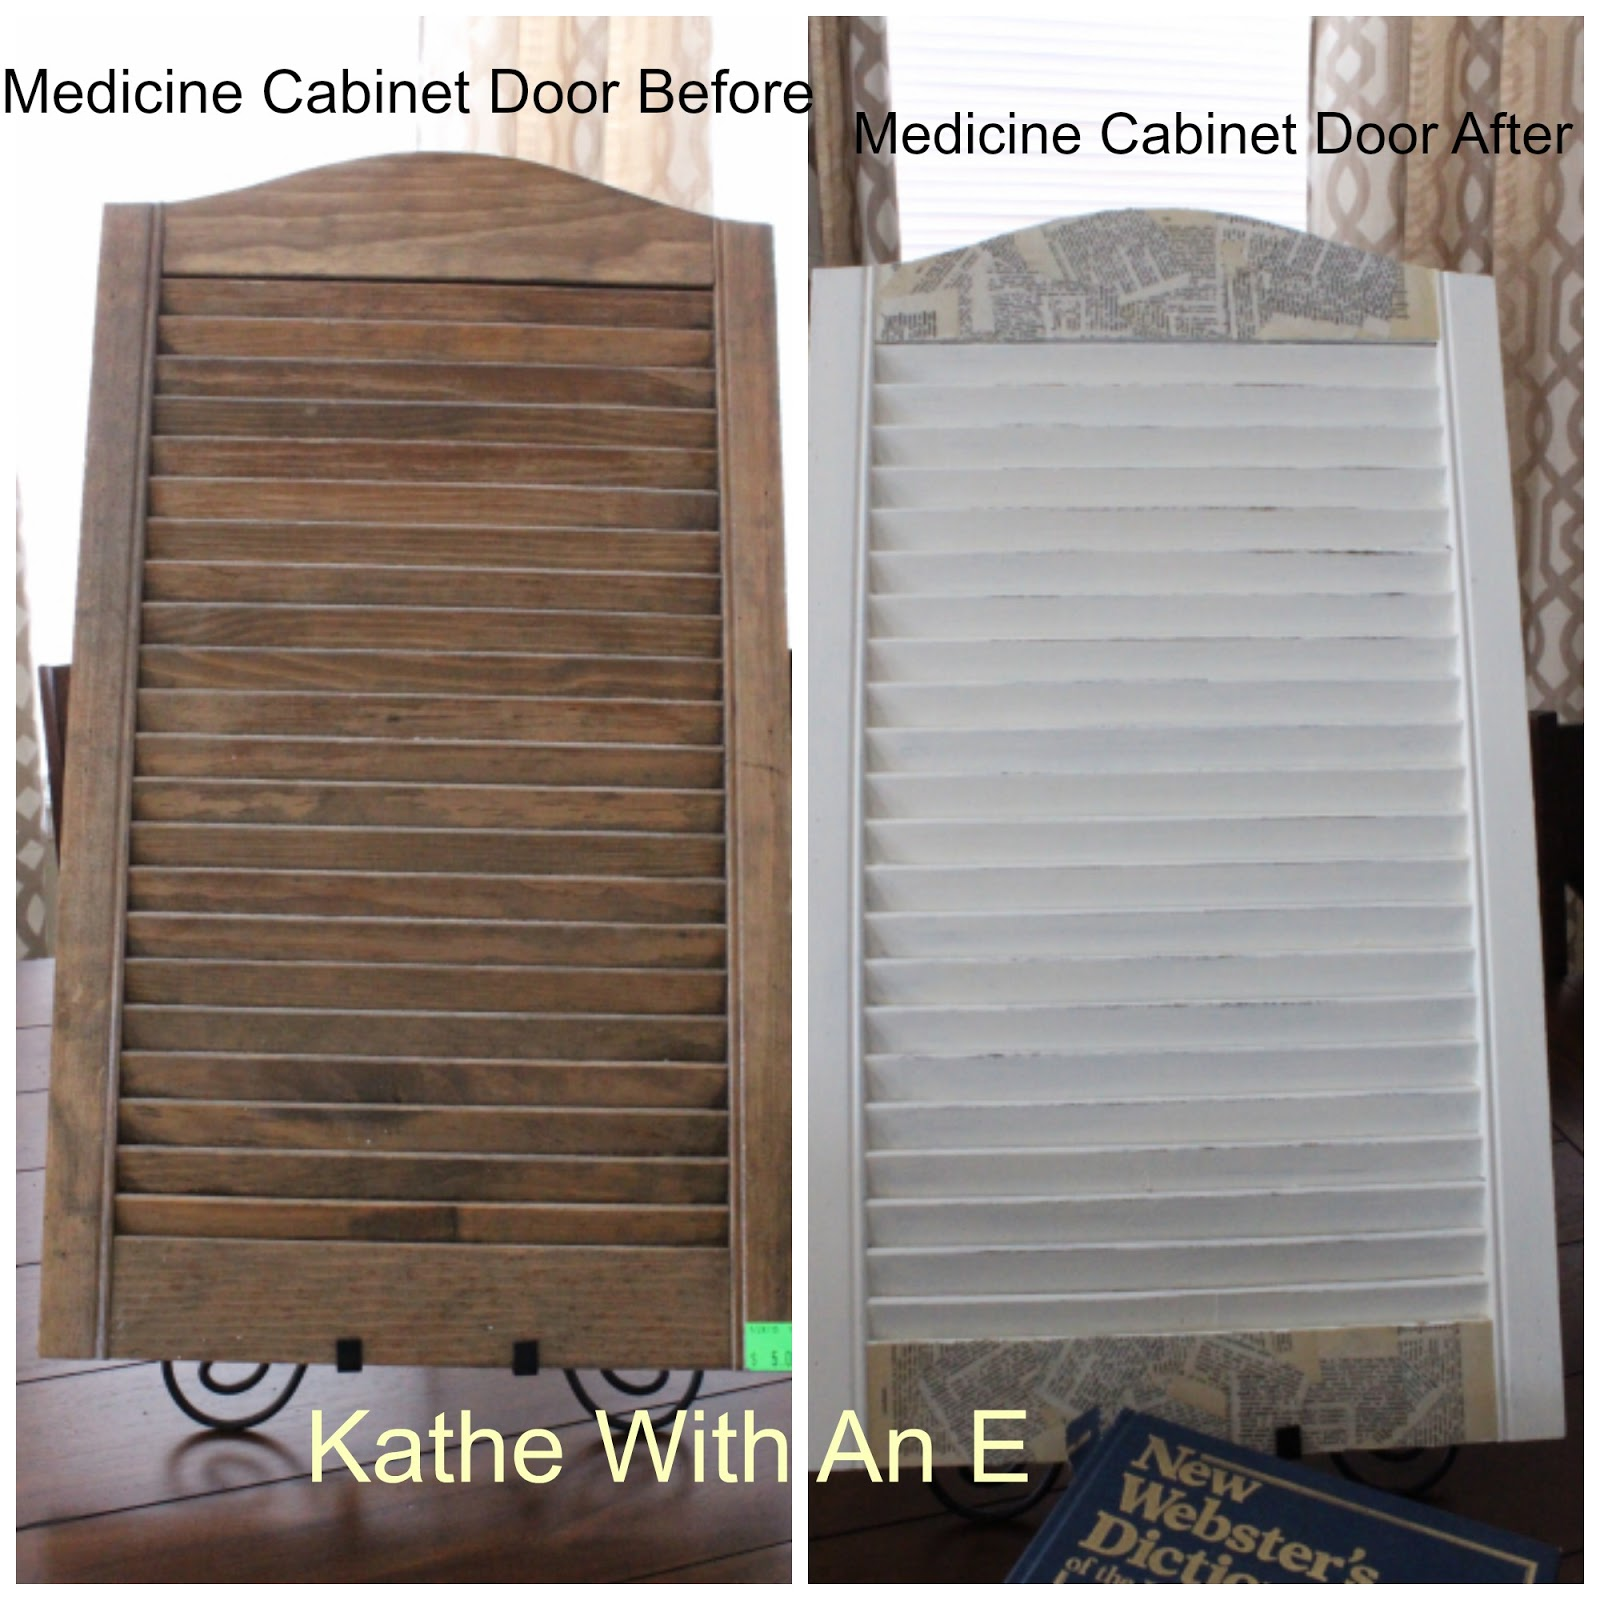 Kathe With an E: DIY Shutter From A Bathroom Medicine Cabinet